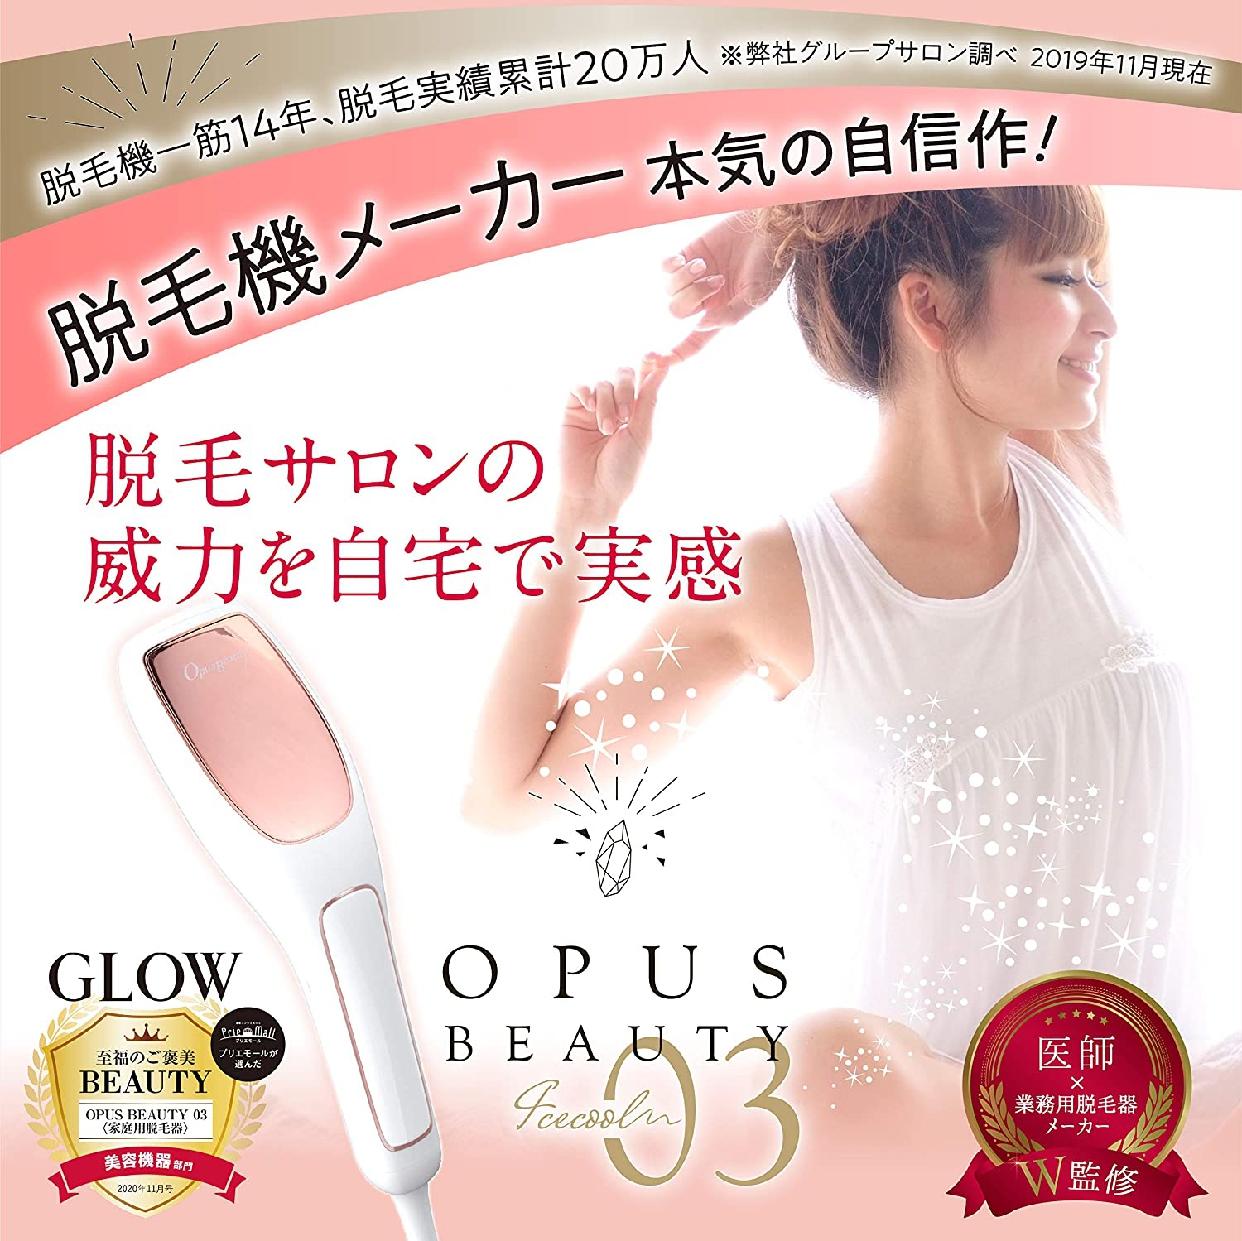 OPUS BEAUTY(オーパスビューティ) オーパスビューティーゼロスリーの商品画像4